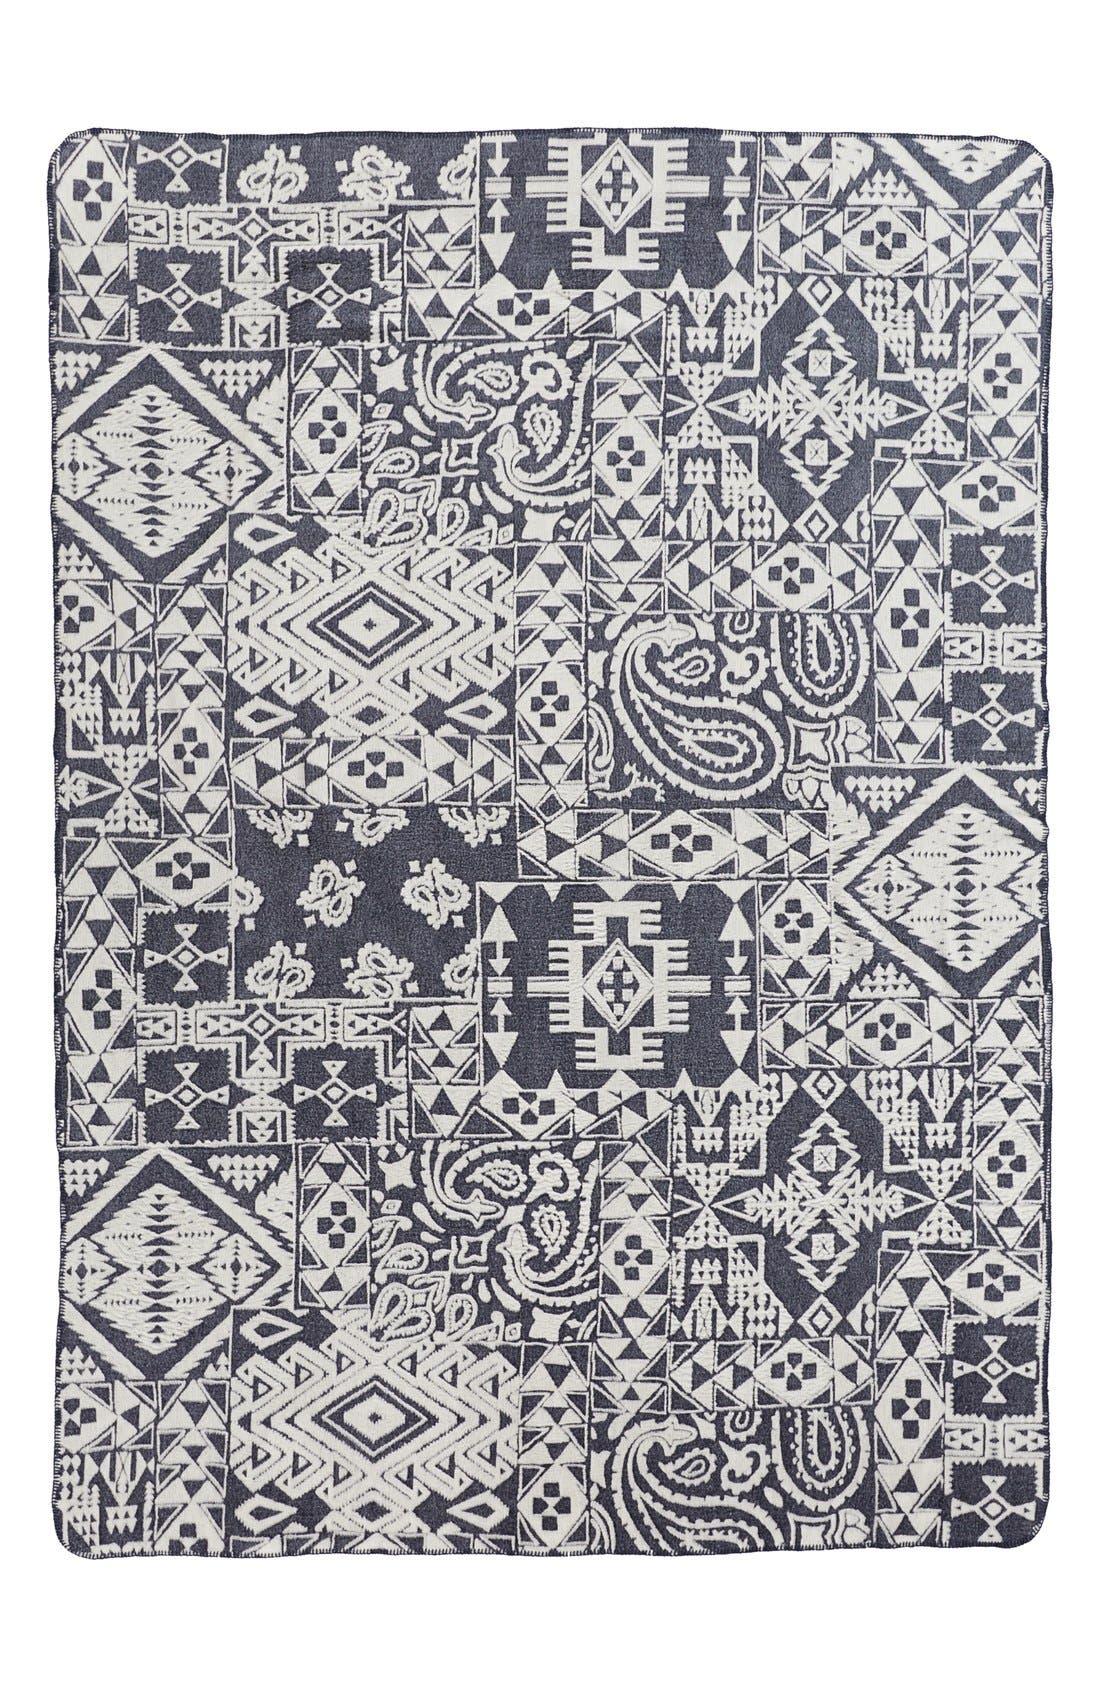 Alternate Image 1 Selected - Pendleton 'Bandana' Cotton Jacquard Blanket